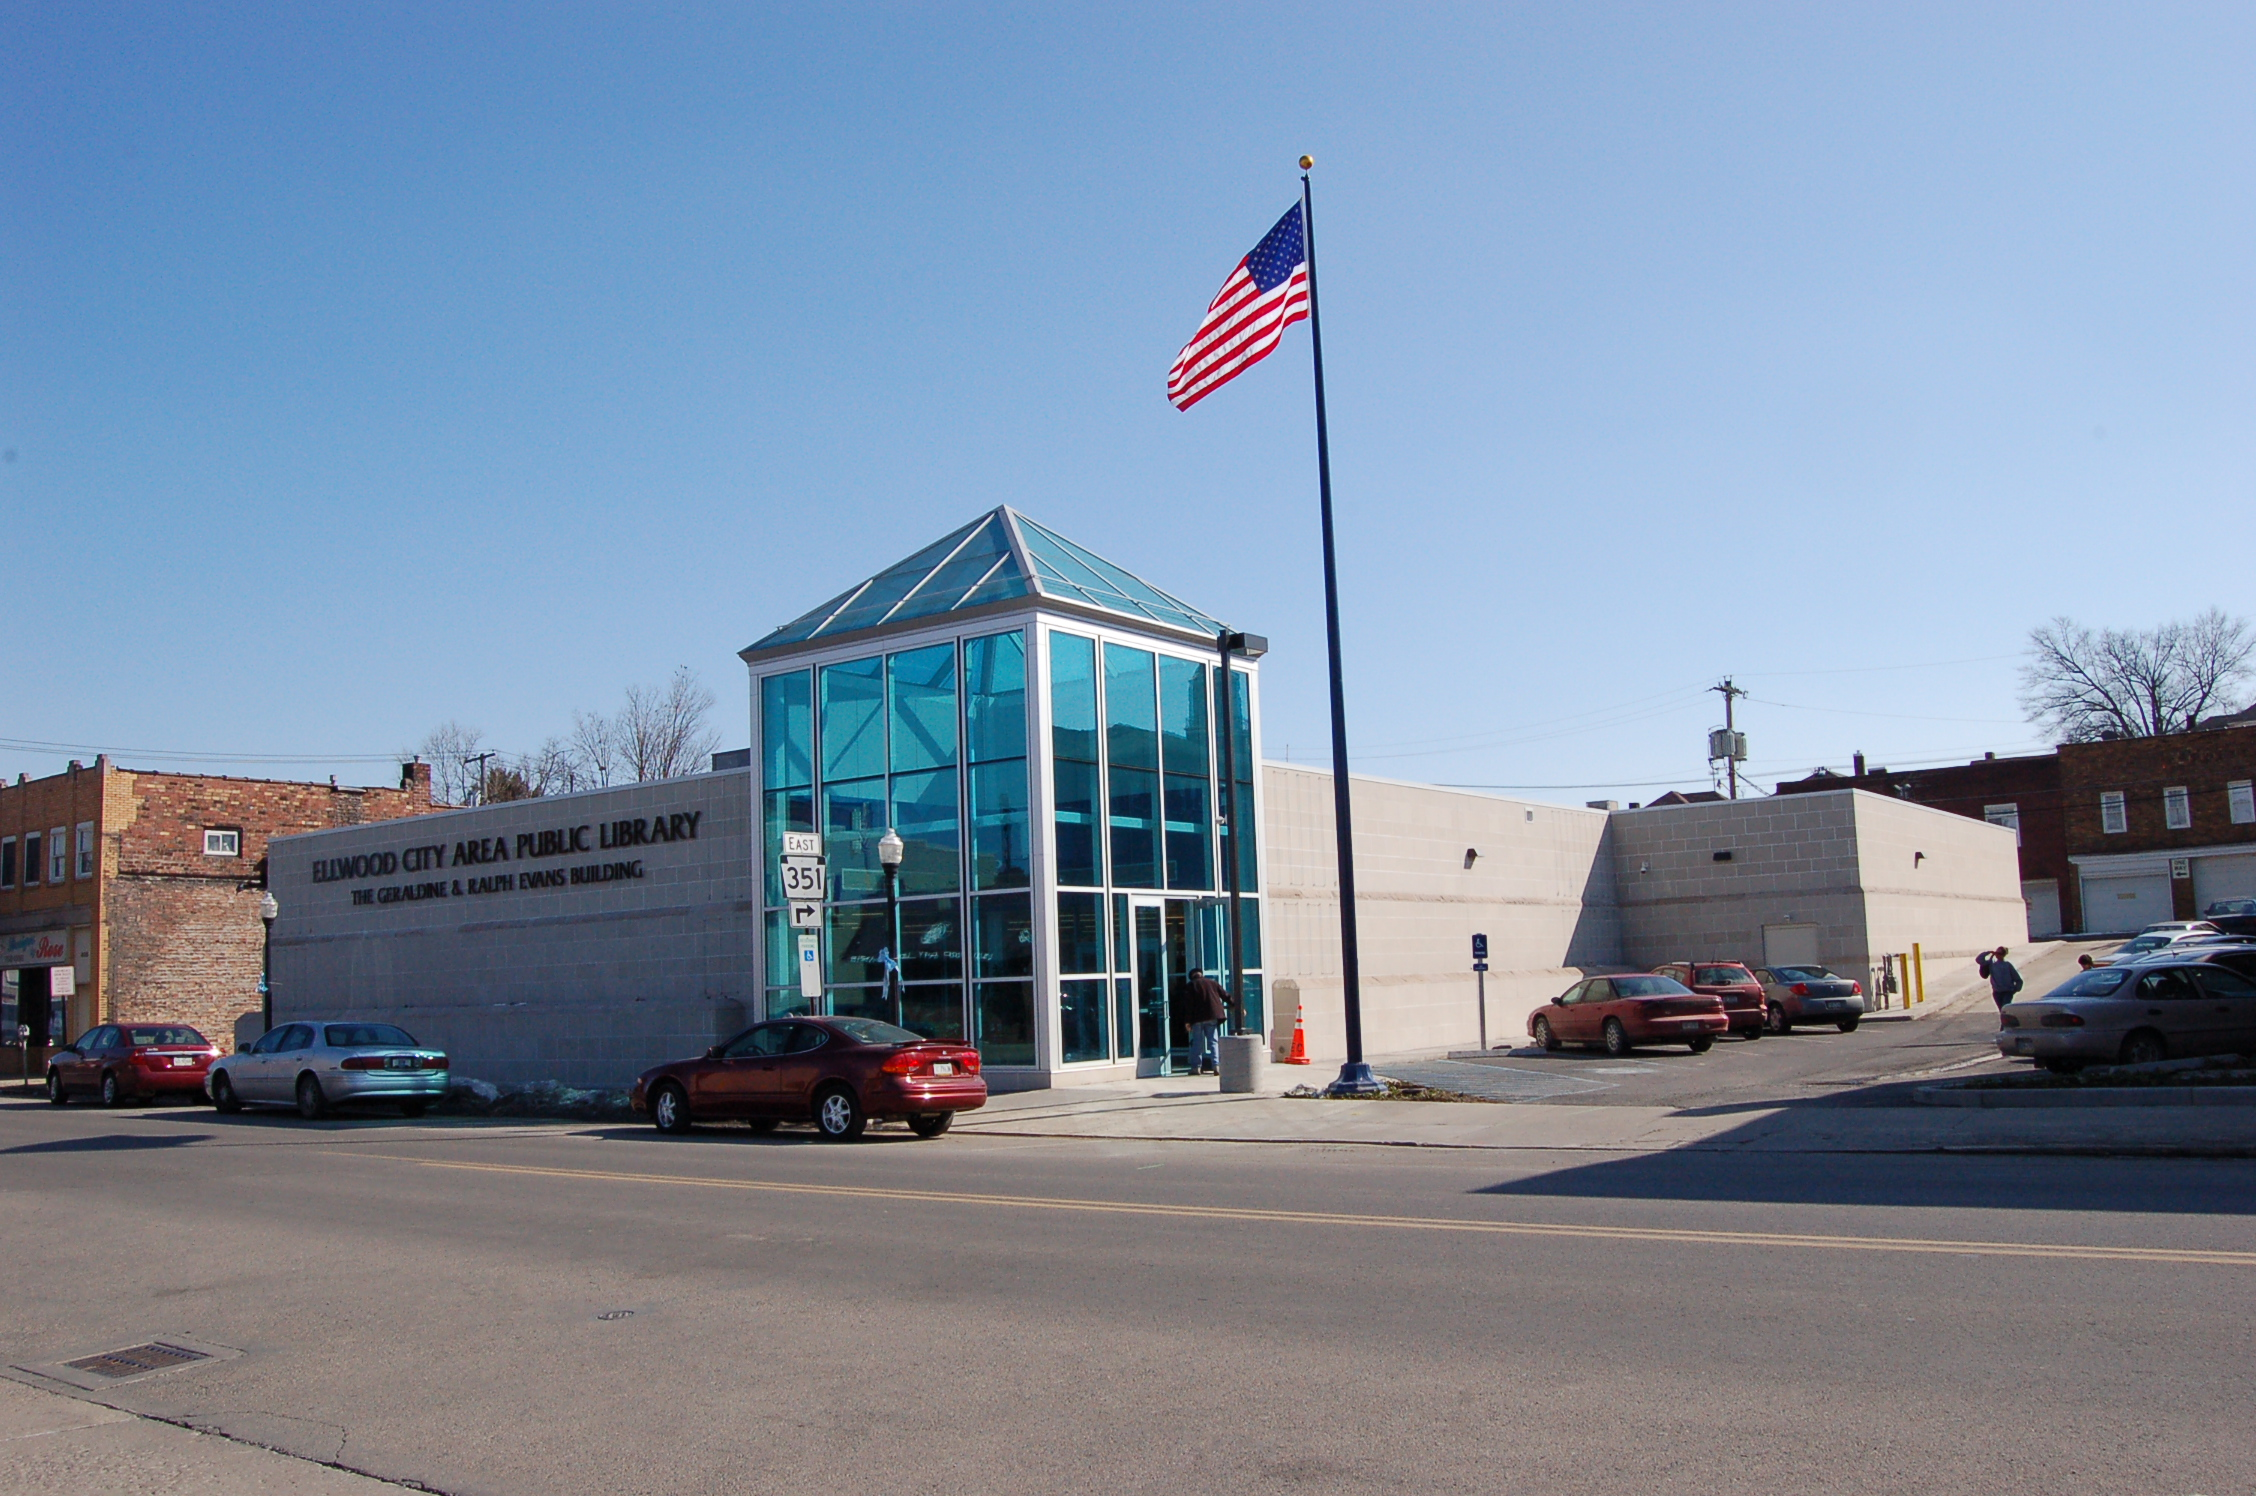 Ellwood City Public Library, Ellwood City, PA (AFTER)